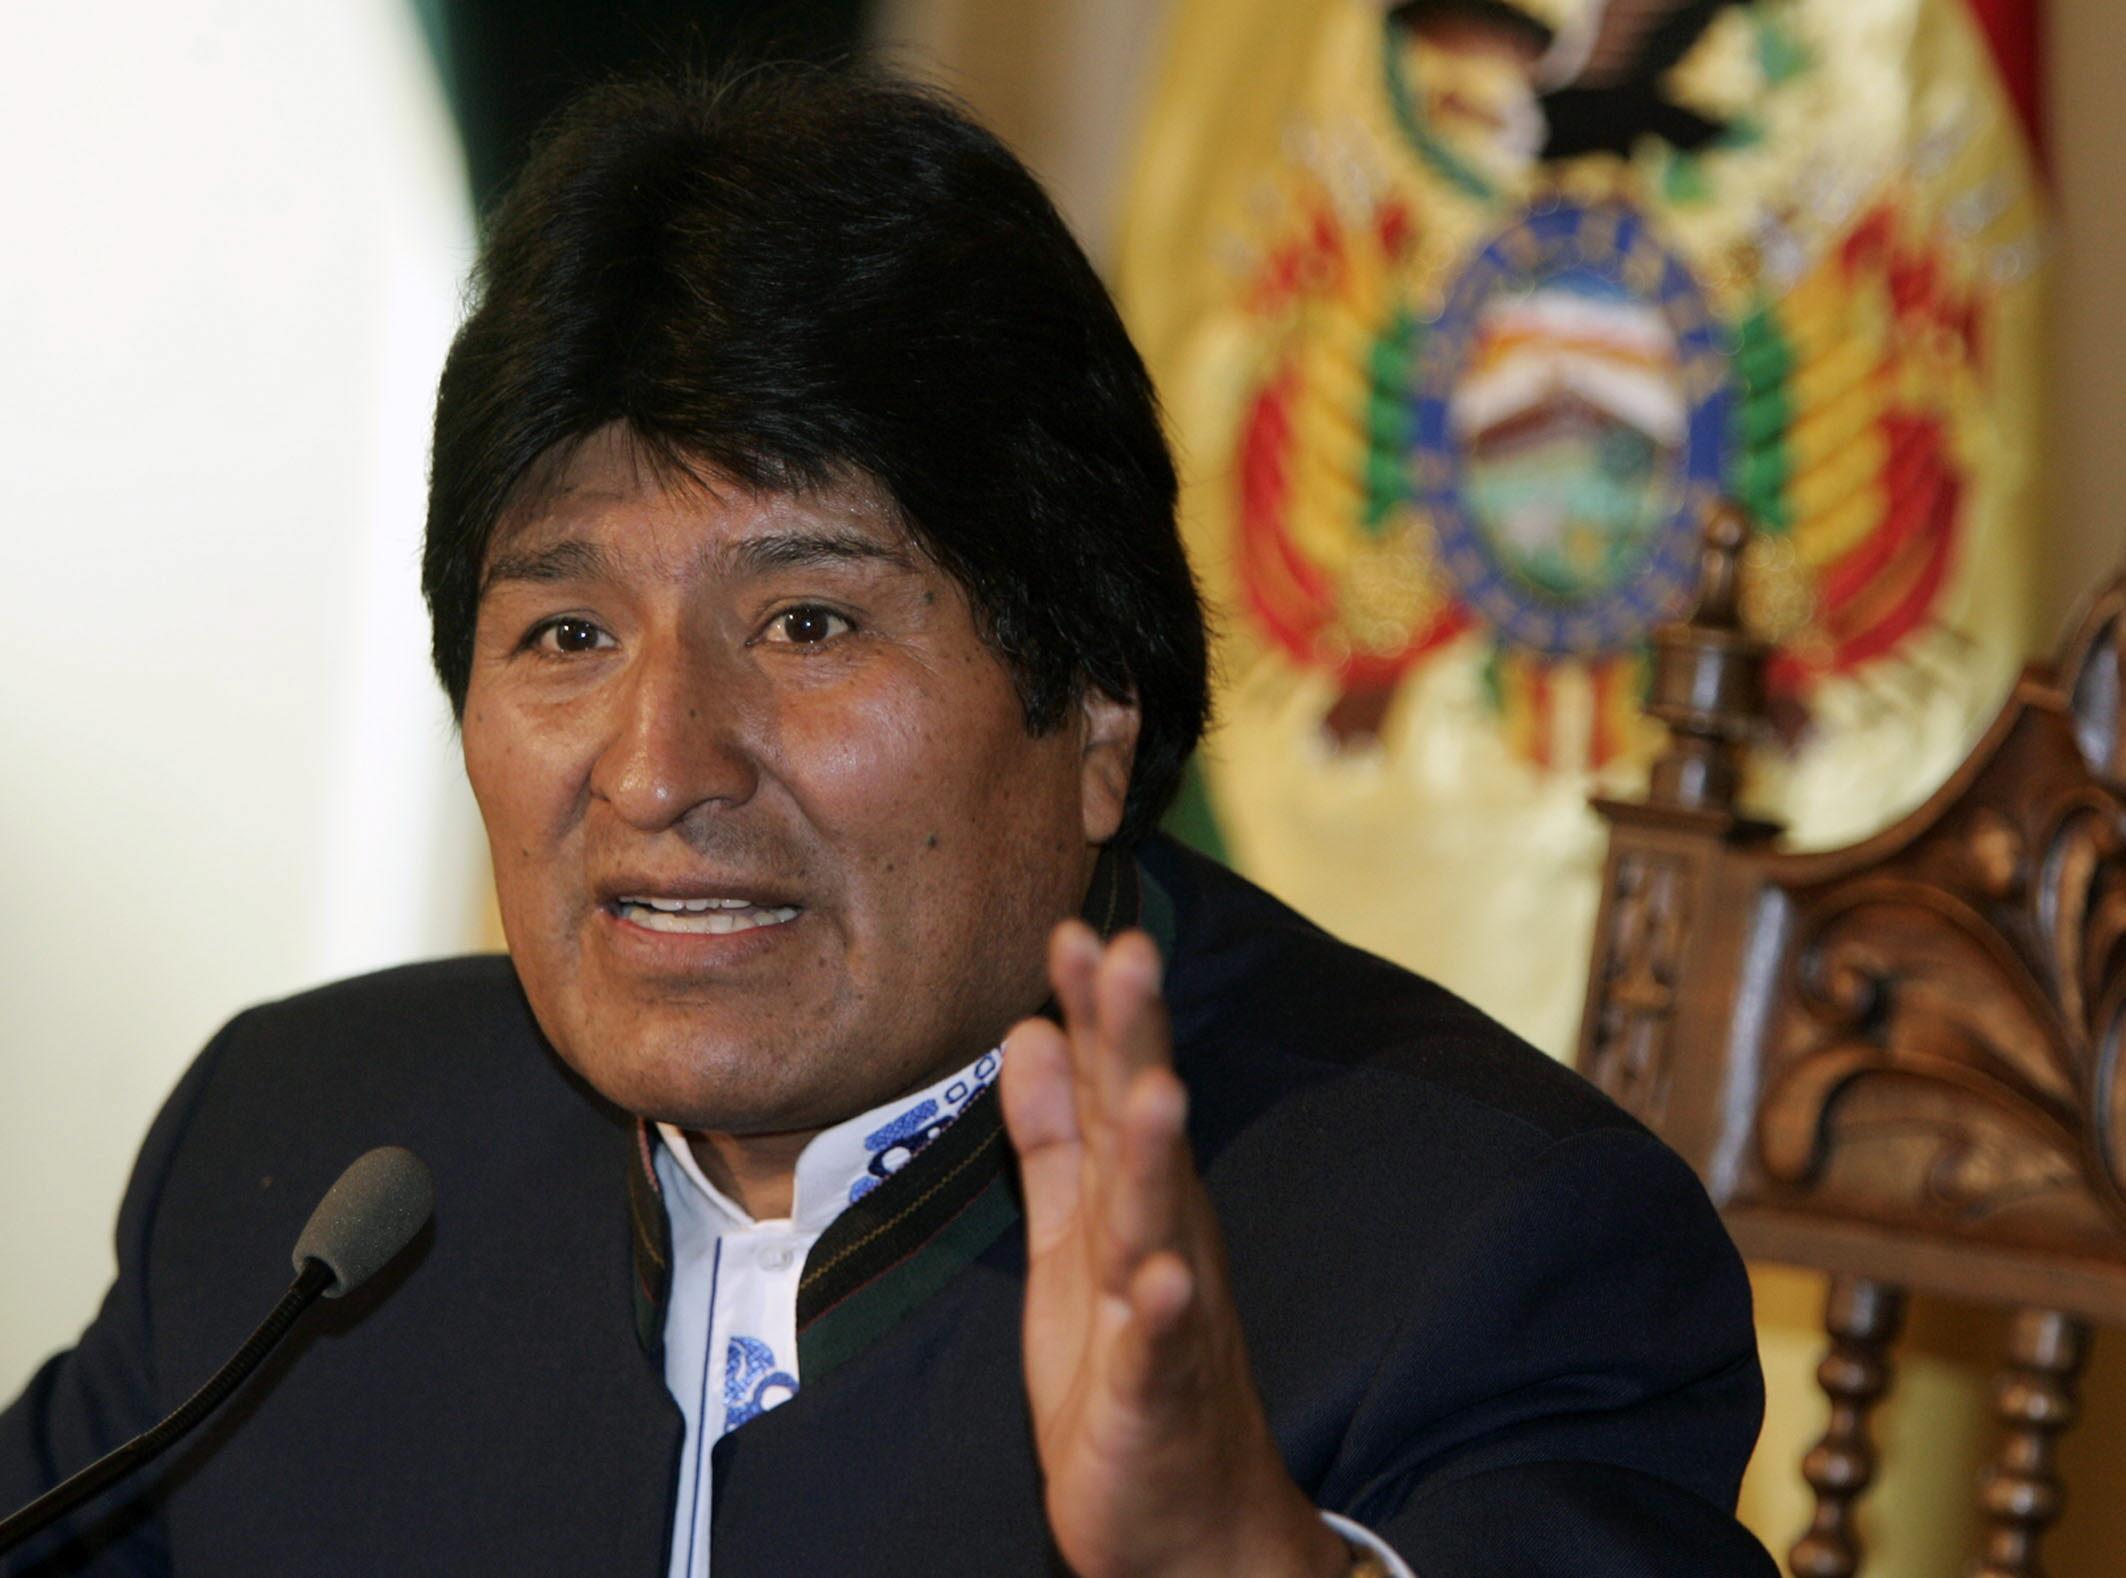 Abertis continúa abierto al diálogo con Bolivia y espera solución pactada